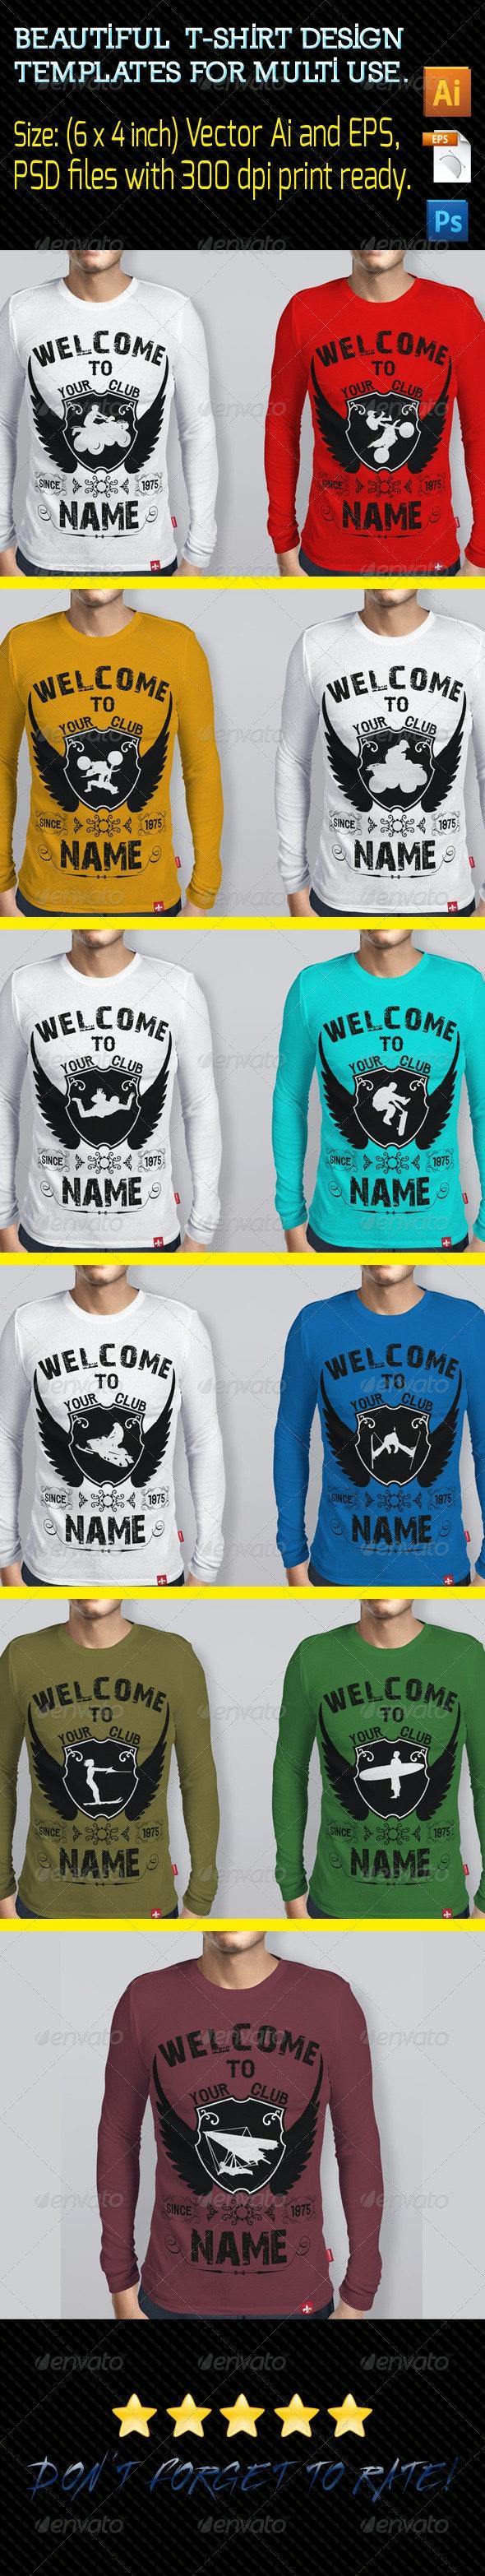 T-Shirts Design Template 01 - Sports & Teams T-Shirts